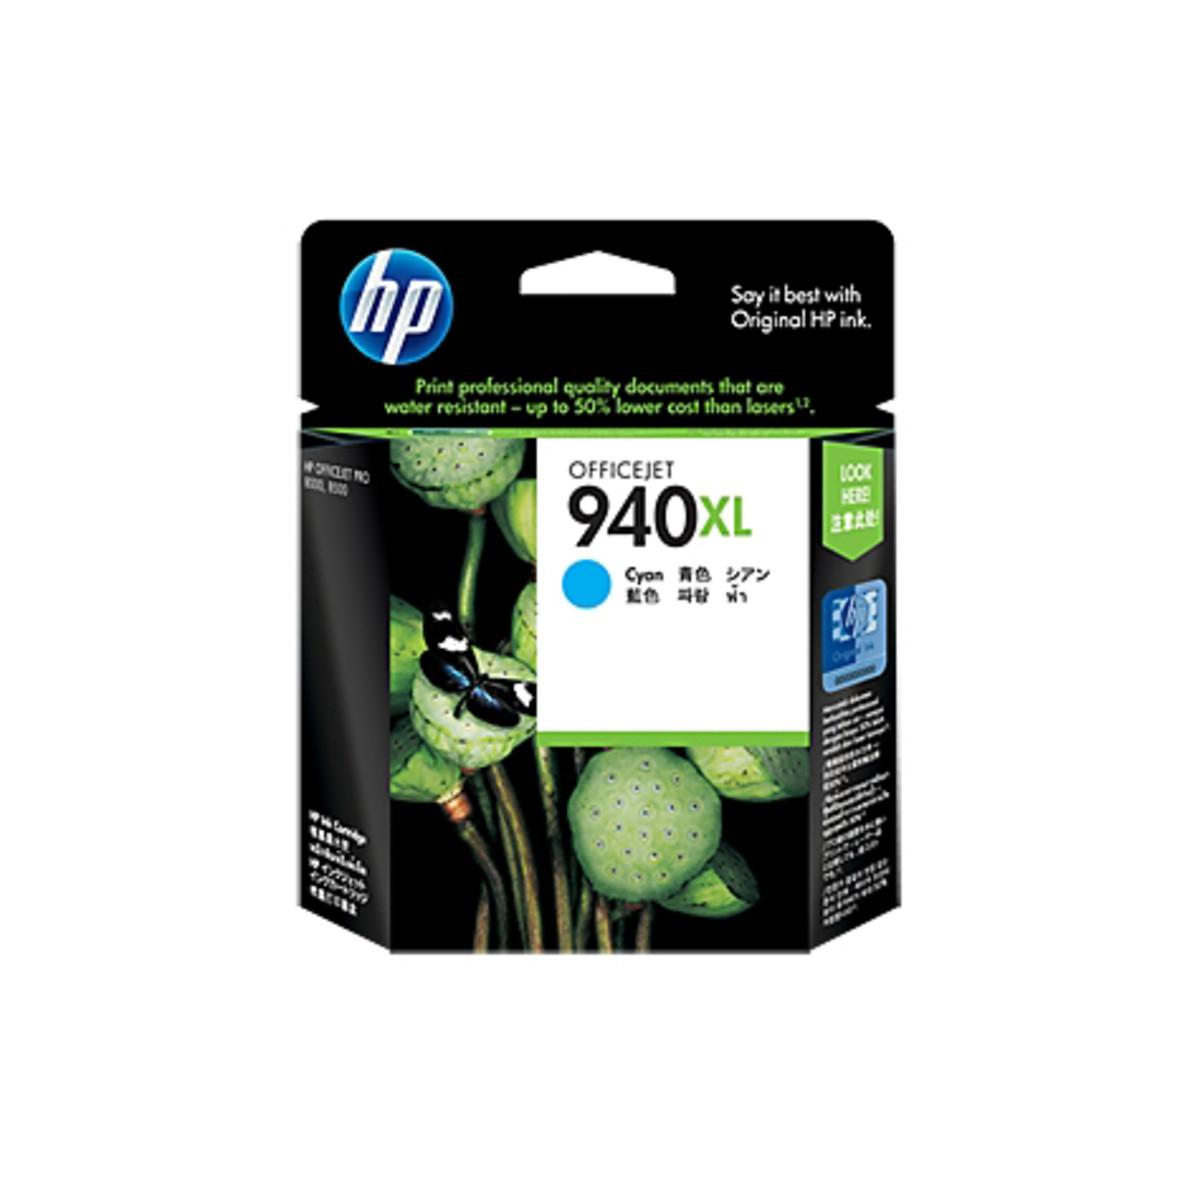 HP 940XL (C4907AA) Cyan Ink Cartridge - High Yield